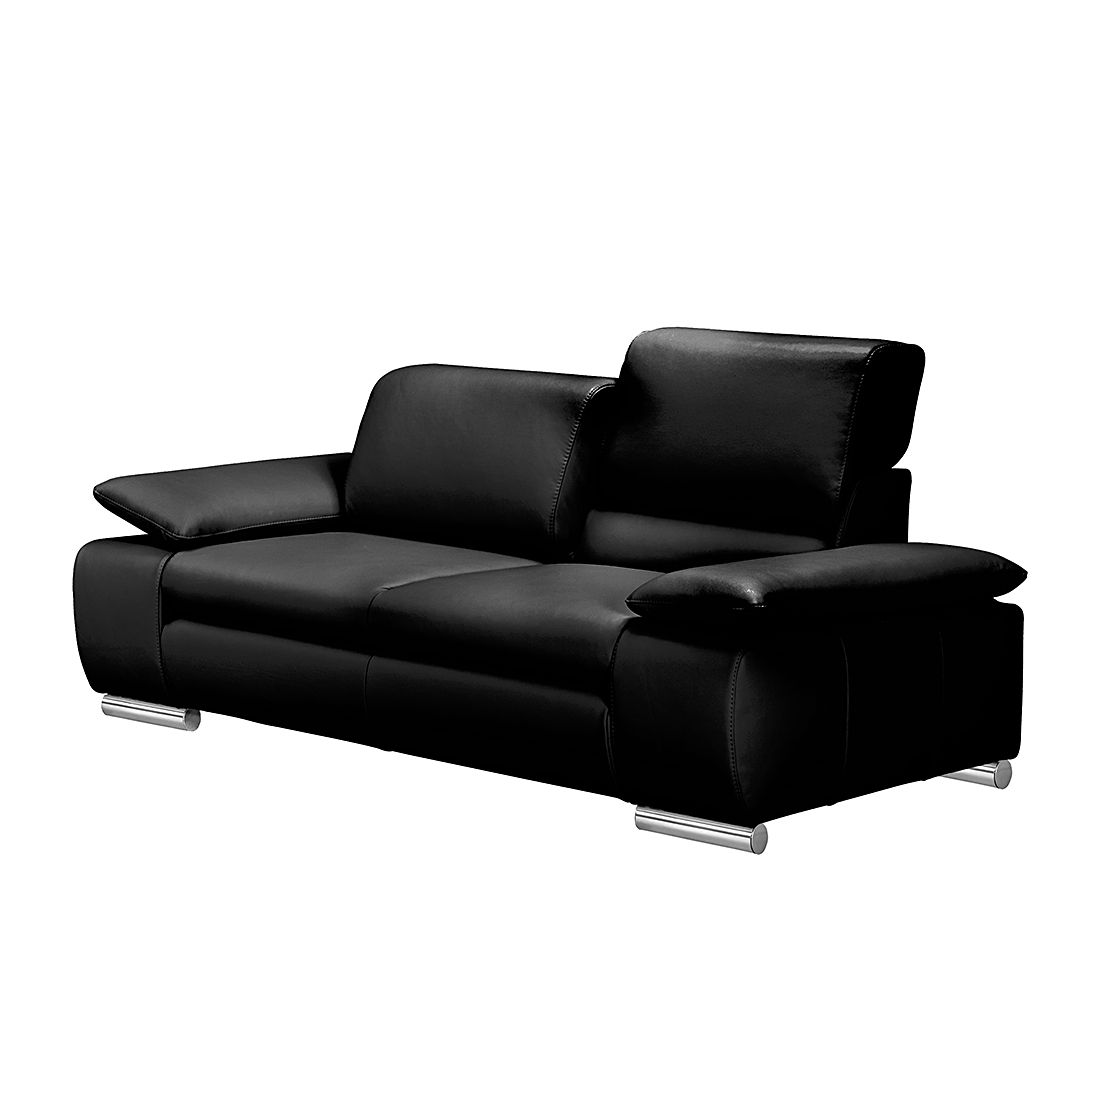 Sofa Masca (2-Sitzer) - Kunstleder Schwarz, loftscape